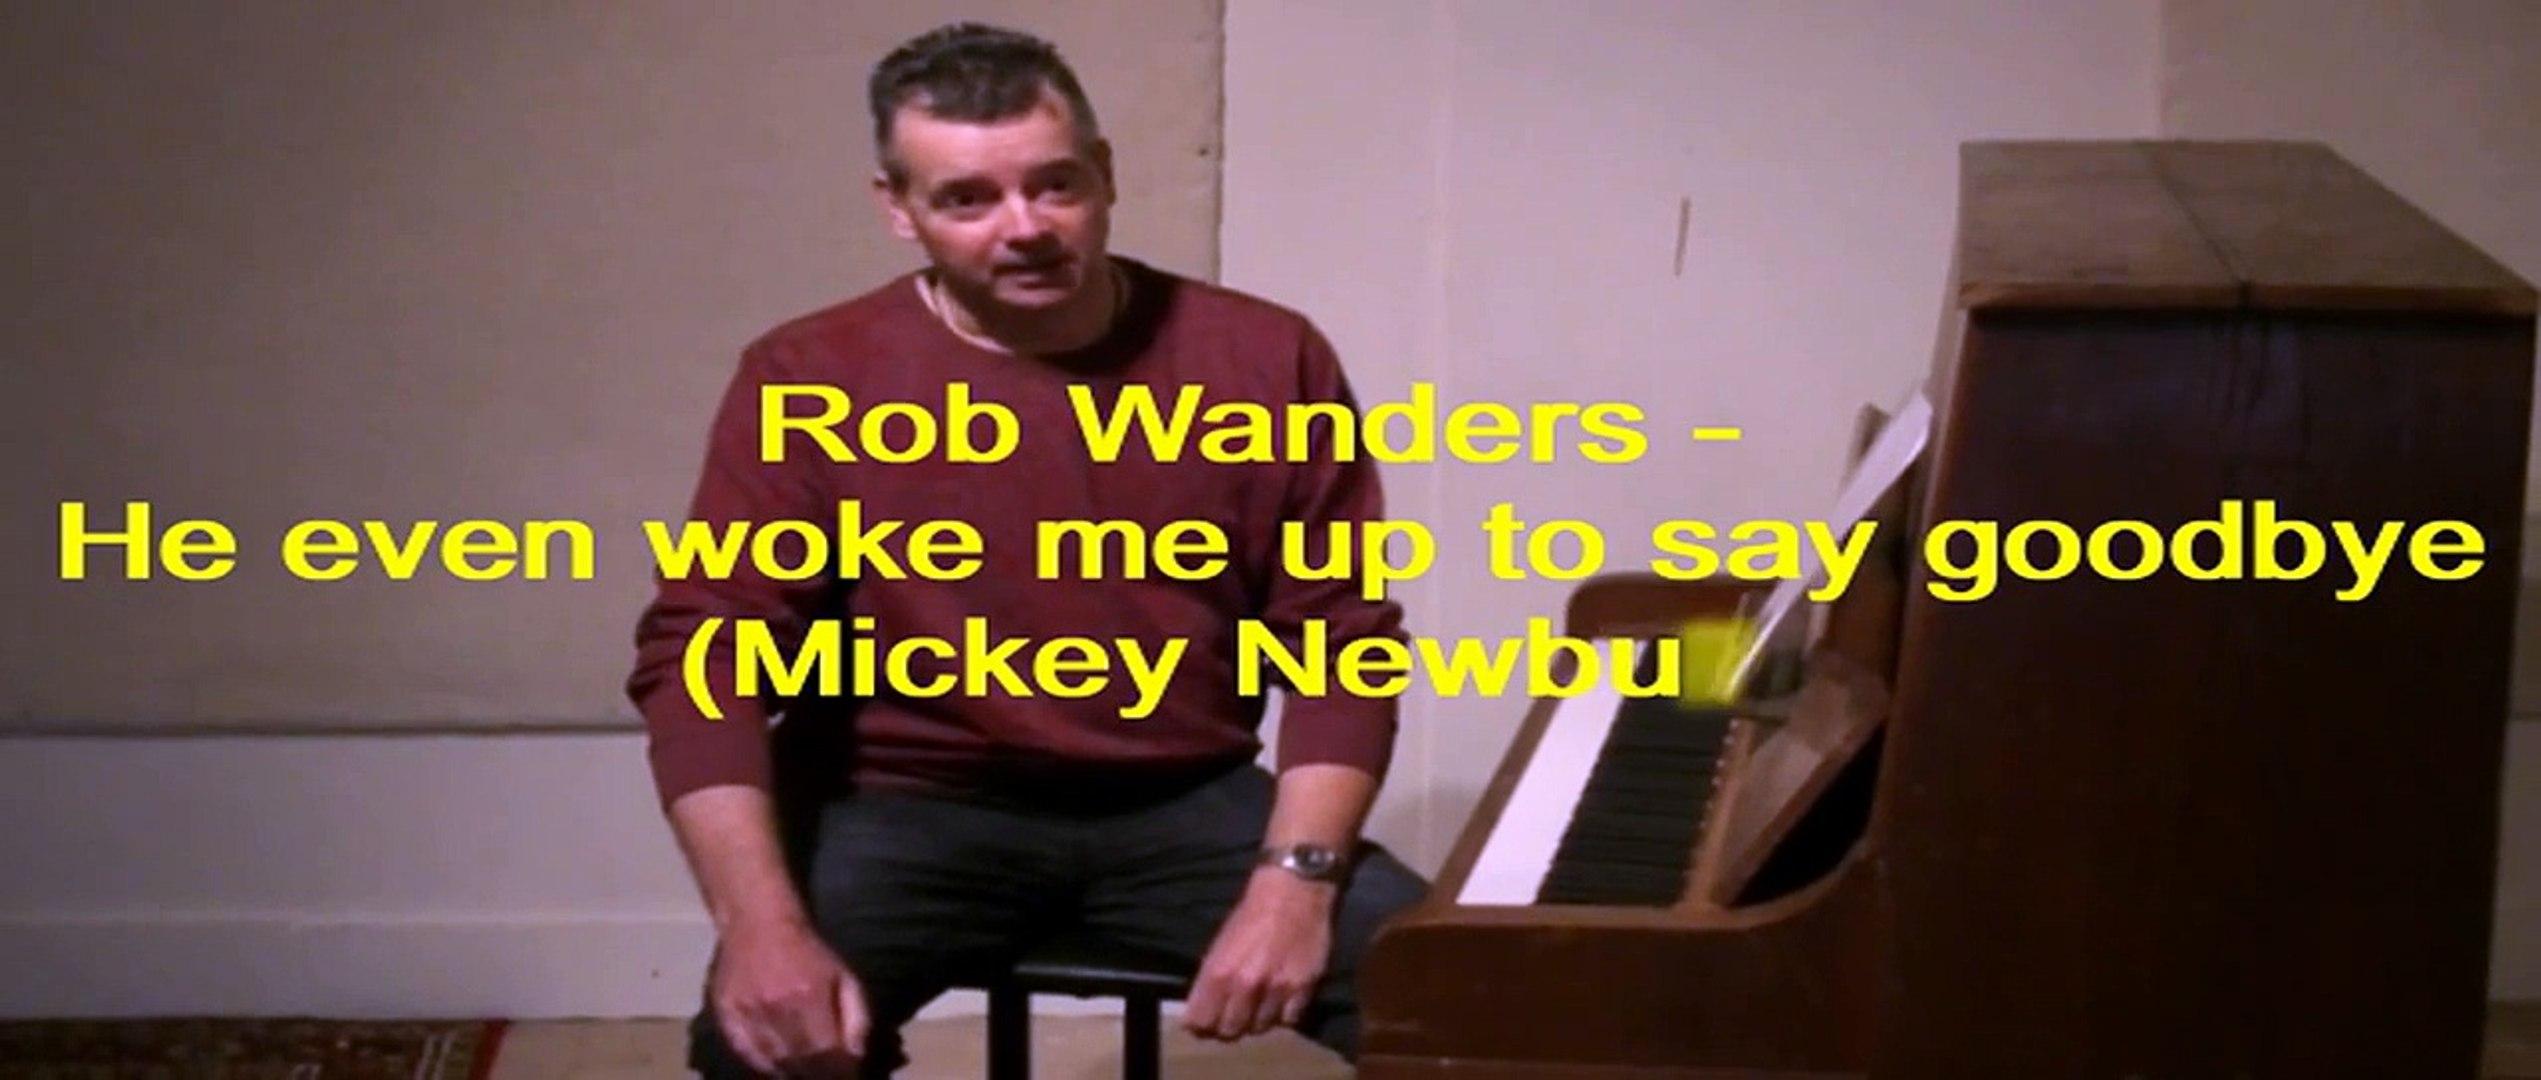 Me He Even Wanders Say Newbury To Rob Up Goodbyemickey Woke BCedxo